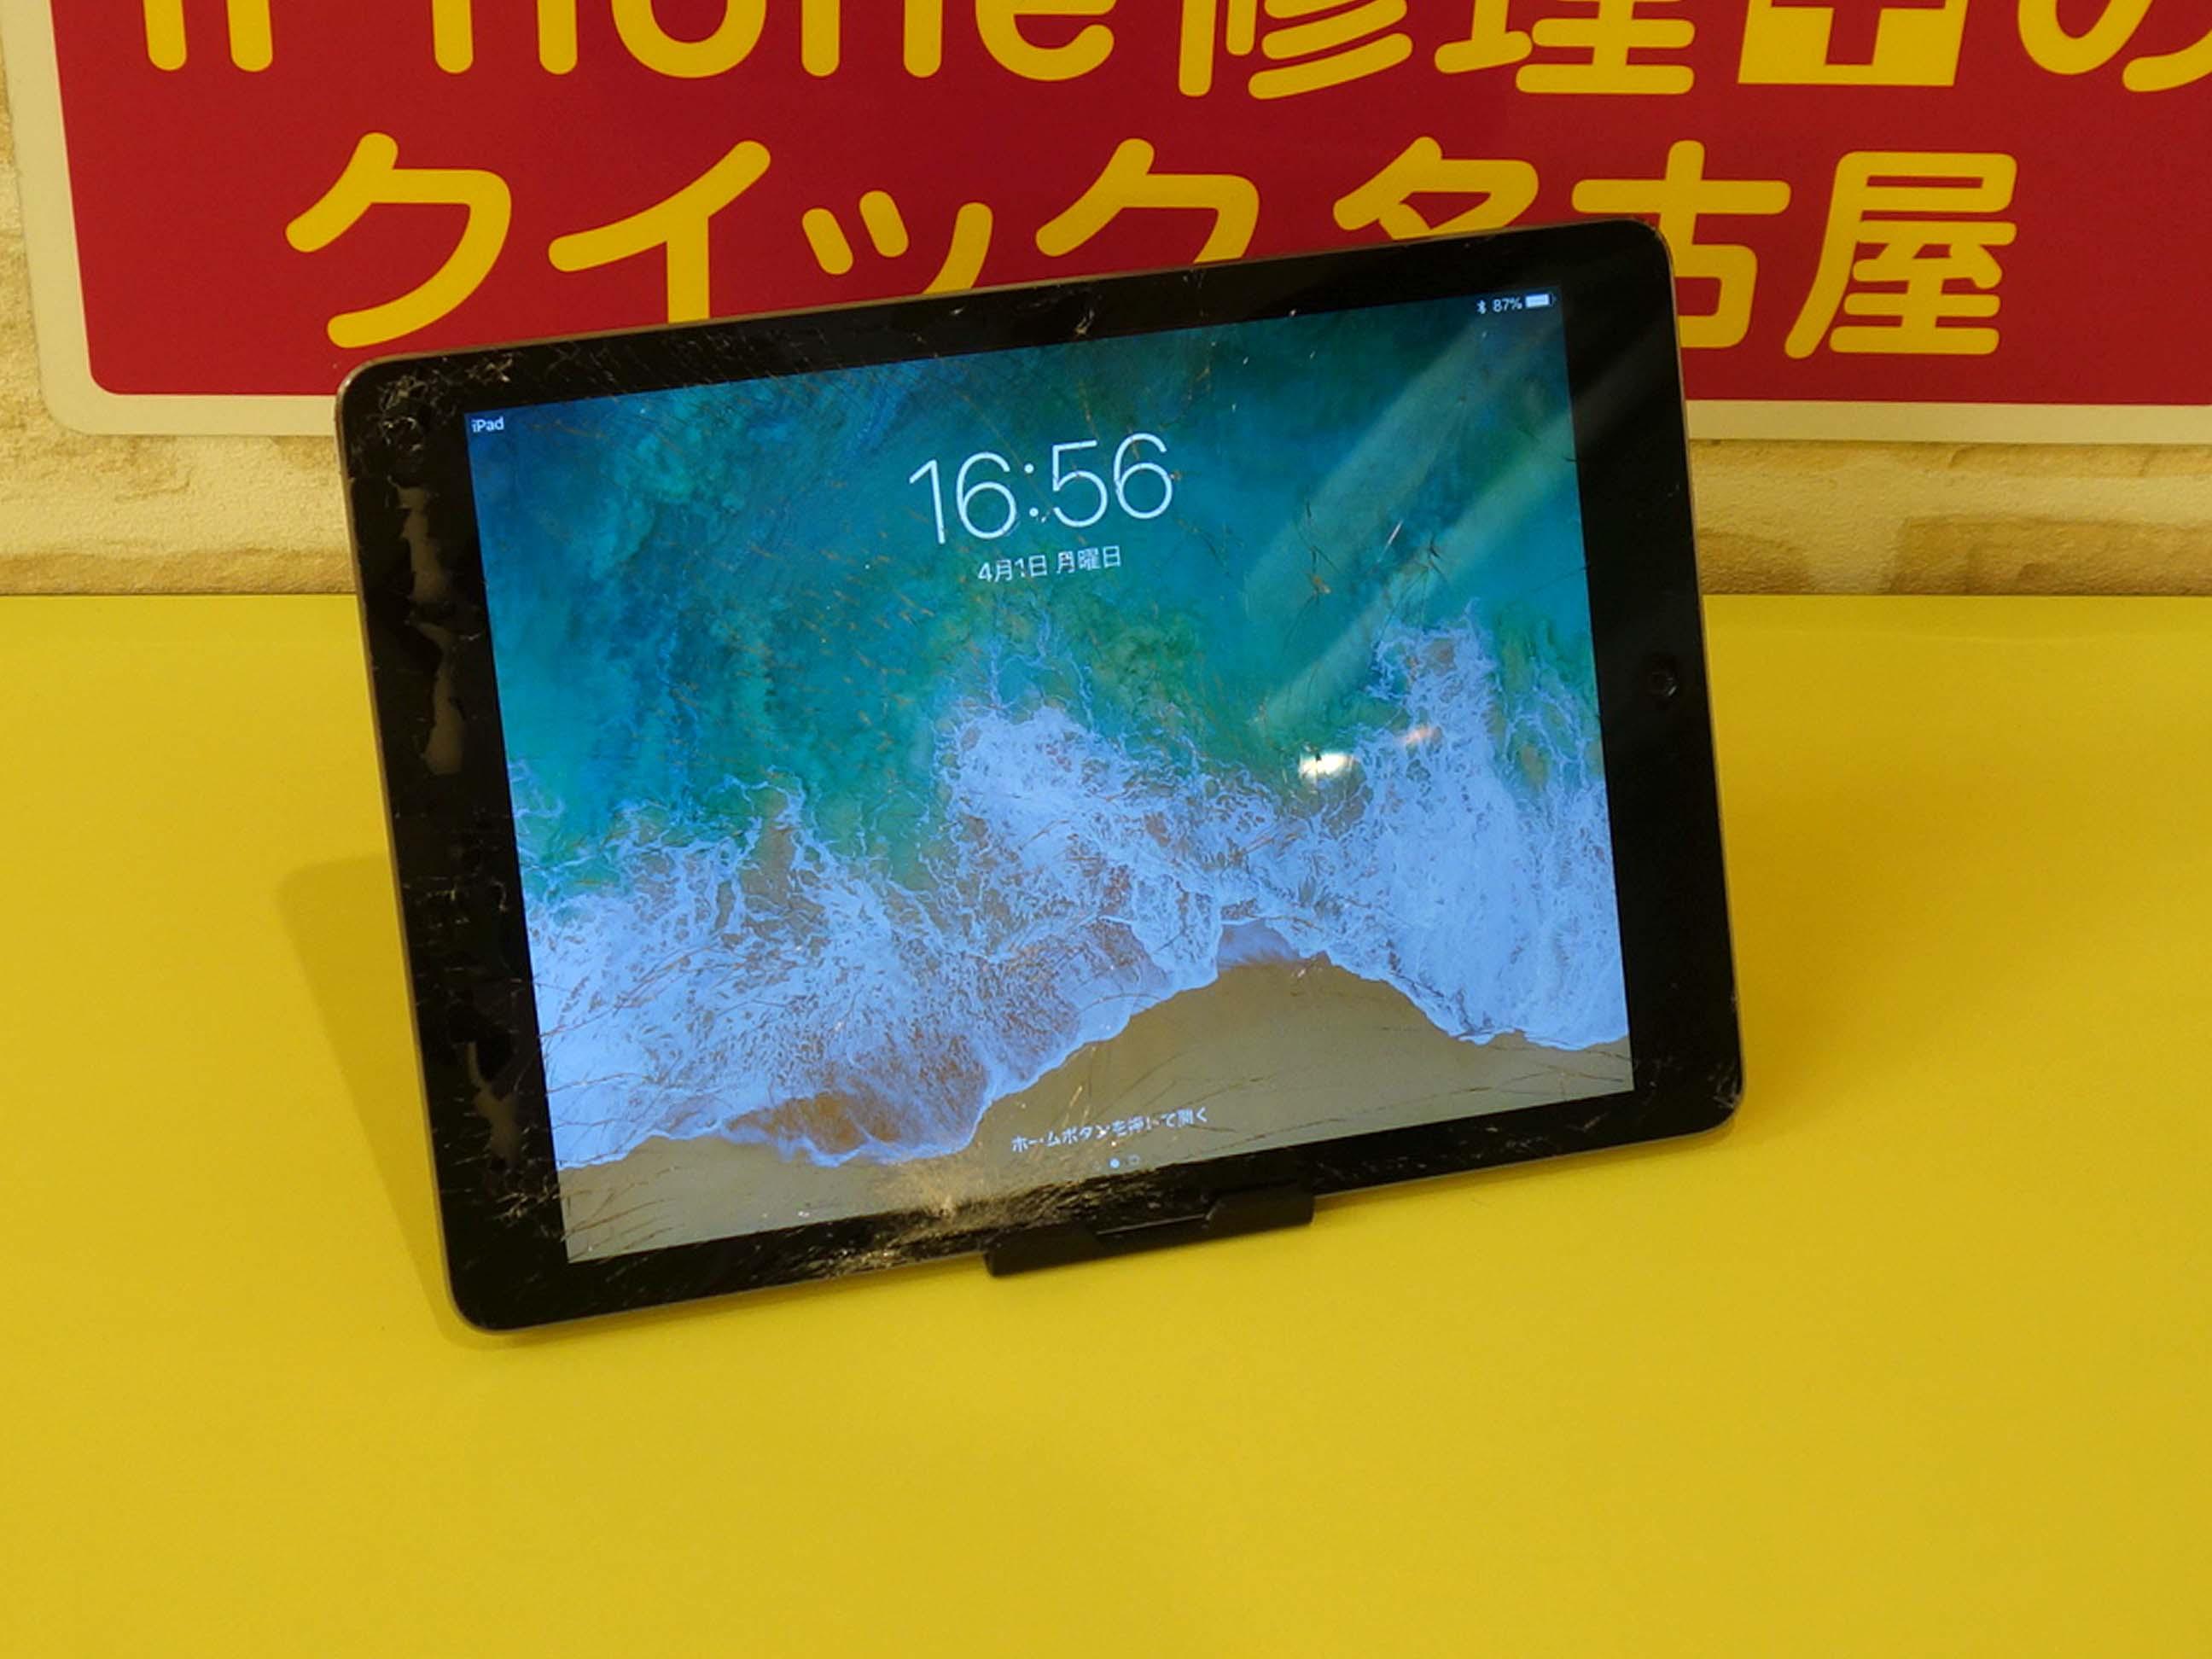 iPadAir1のガラス交換修理に岡崎市よりご来店!アイパッド修理もクイック名古屋